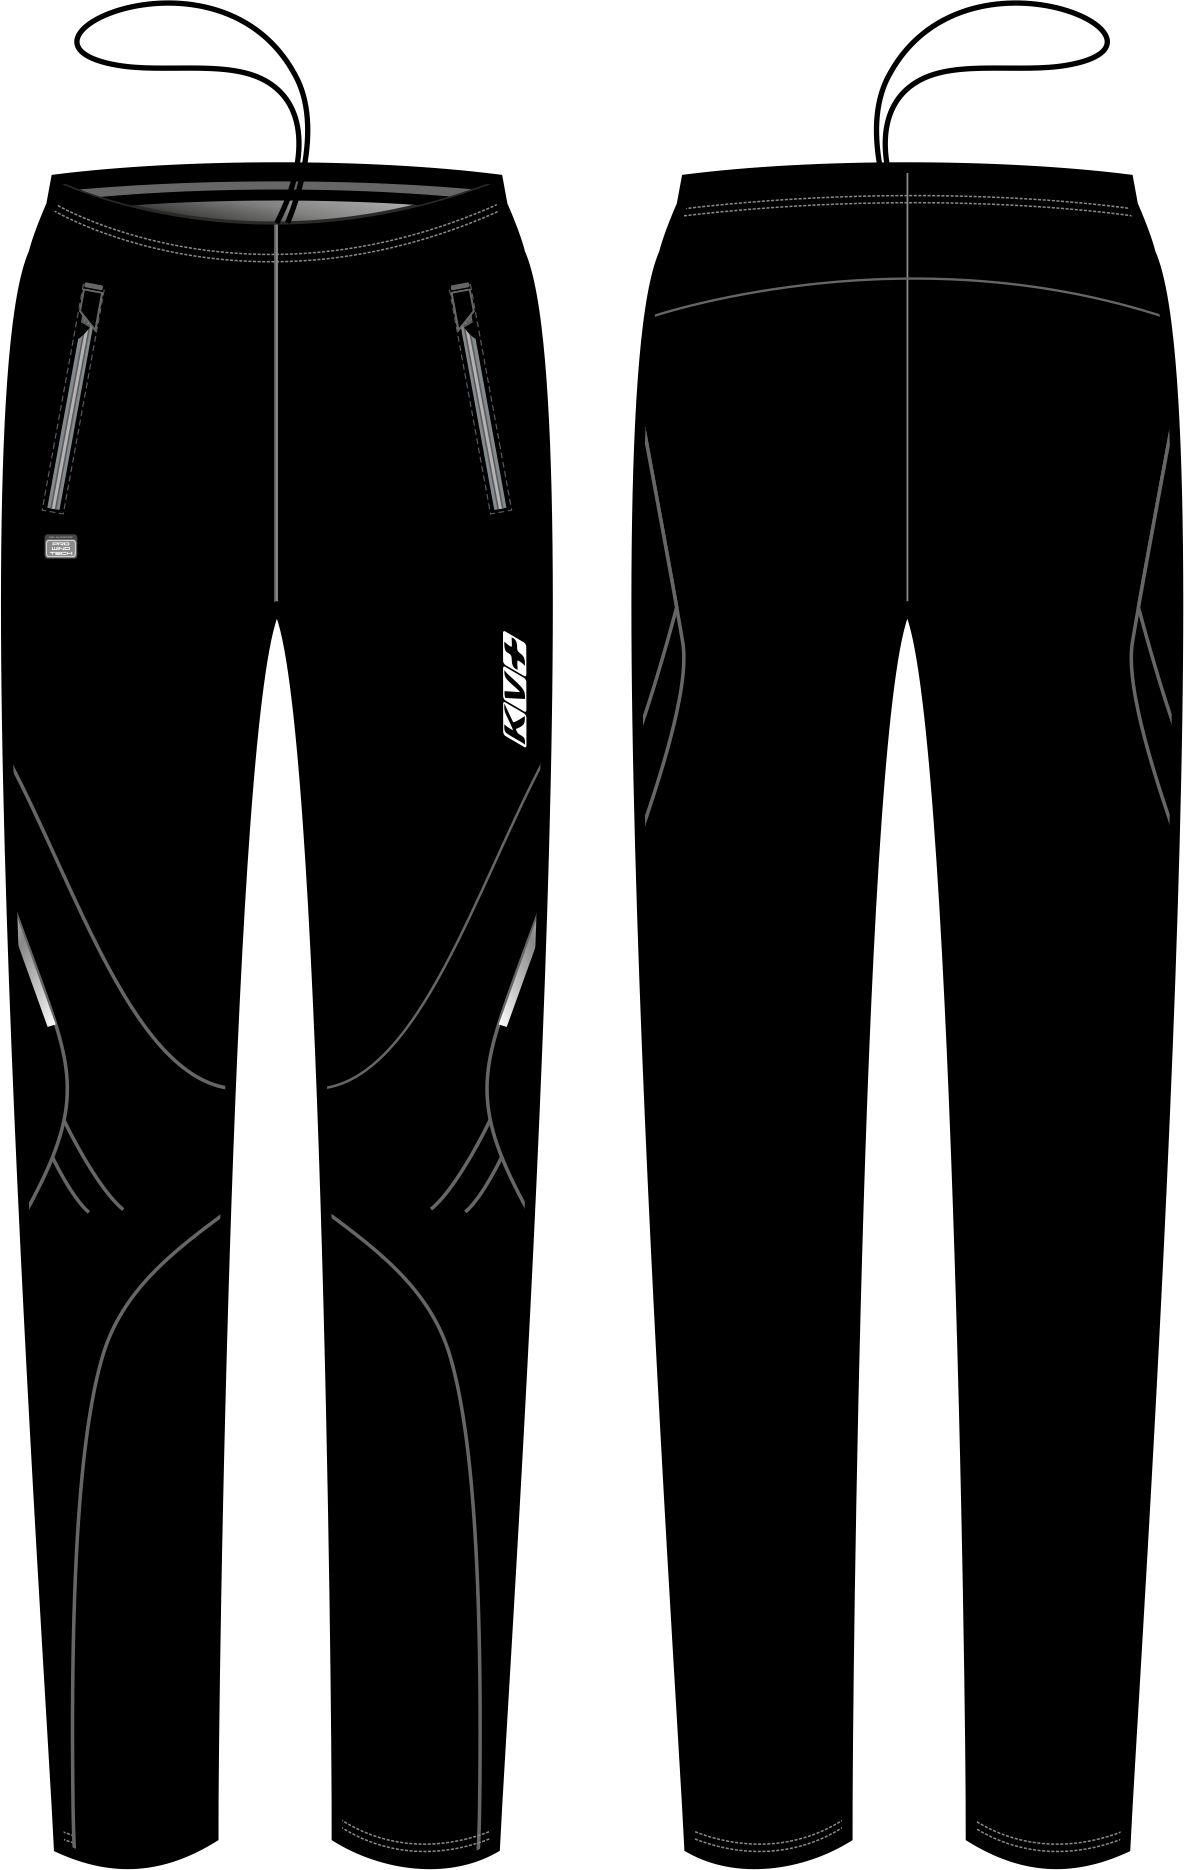 EXCLUSIVE PANTS MAN (black)